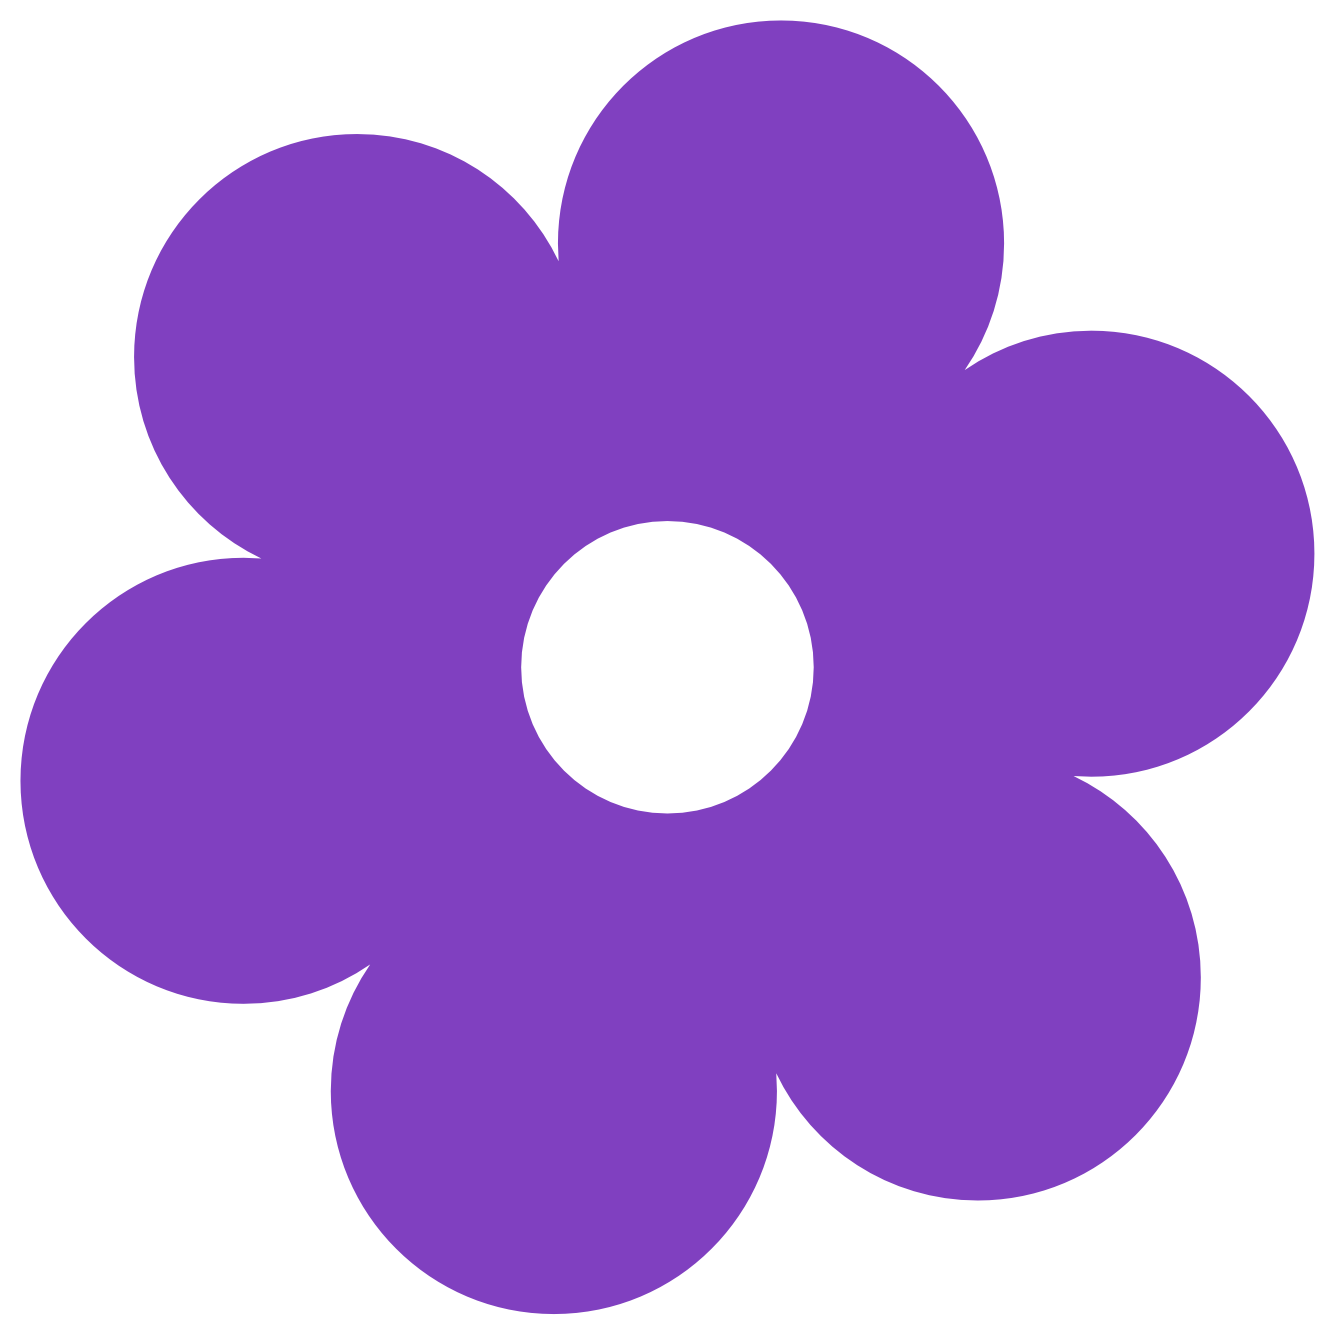 Clip Art Purple Flower Clipart purple flower clipart best retro free download clip art on purple